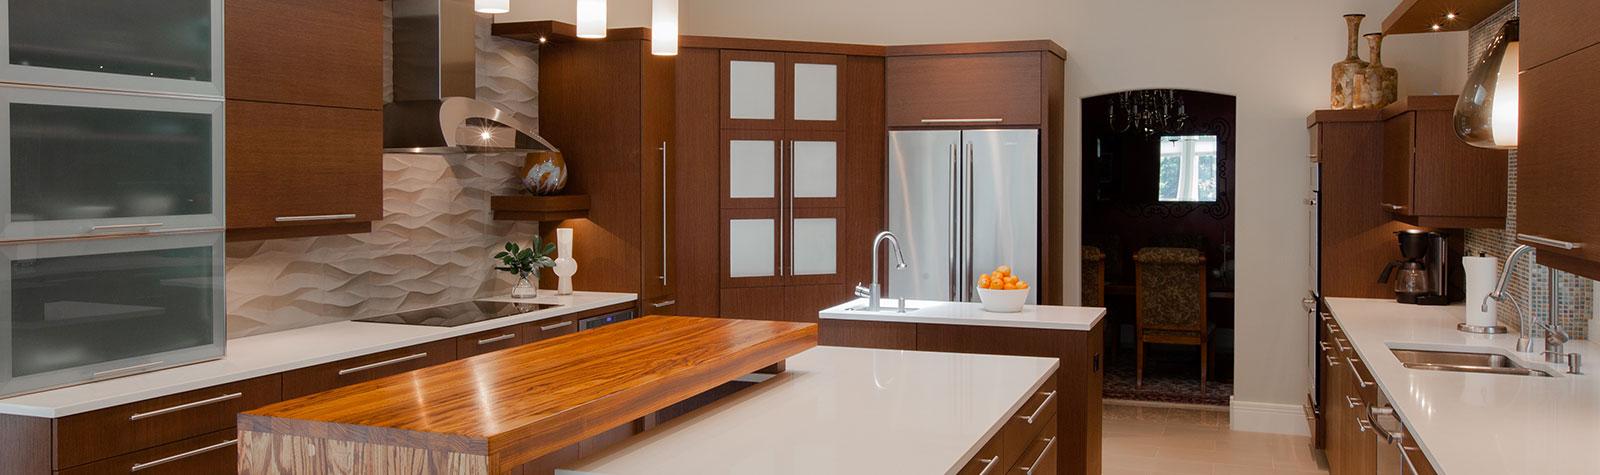 advanced kitchen designs custom cabinetry a drupal cms site by figure w advanced kitchen design